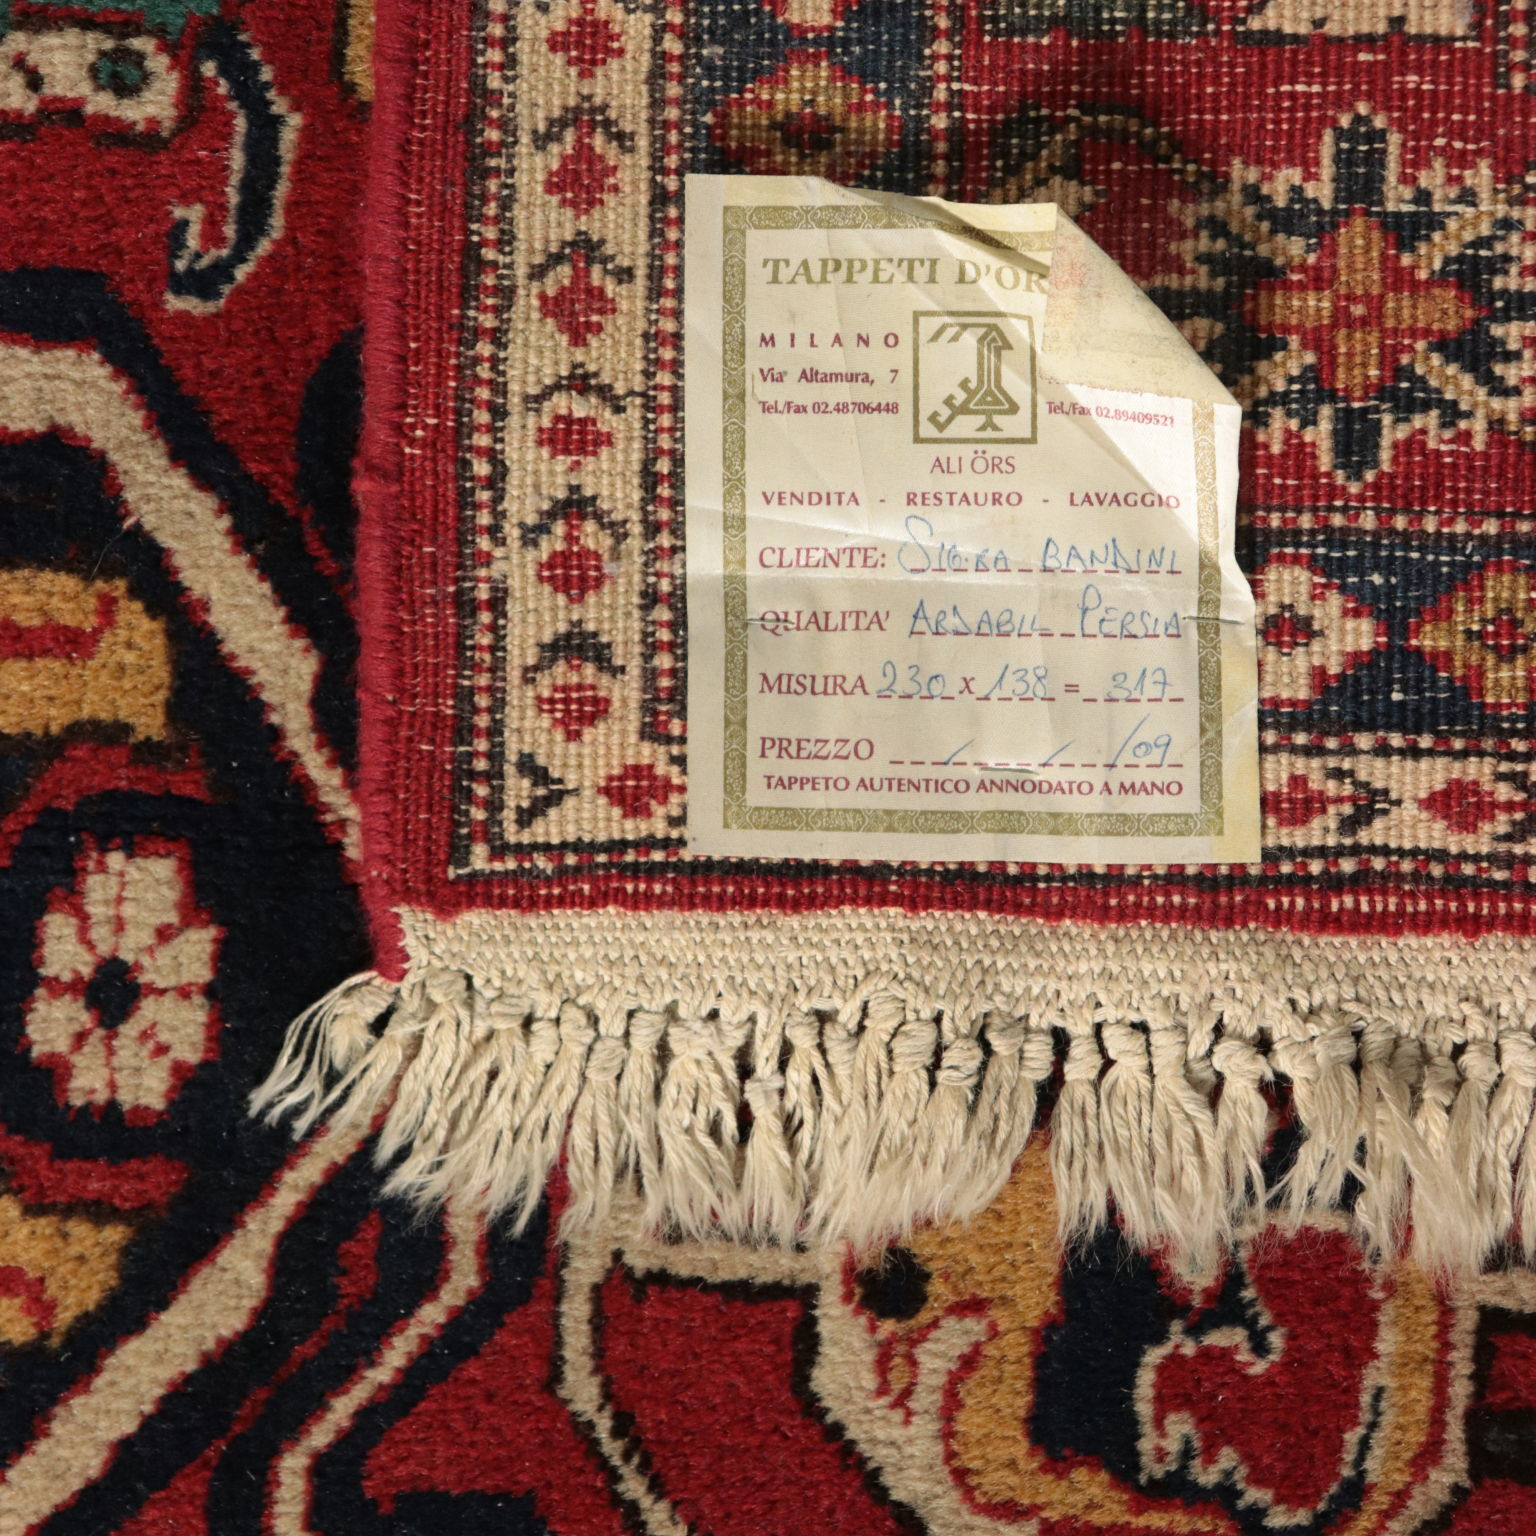 Vendita Tappeti A Milano carpet design kasak ardebil - iran - tappeti - antique